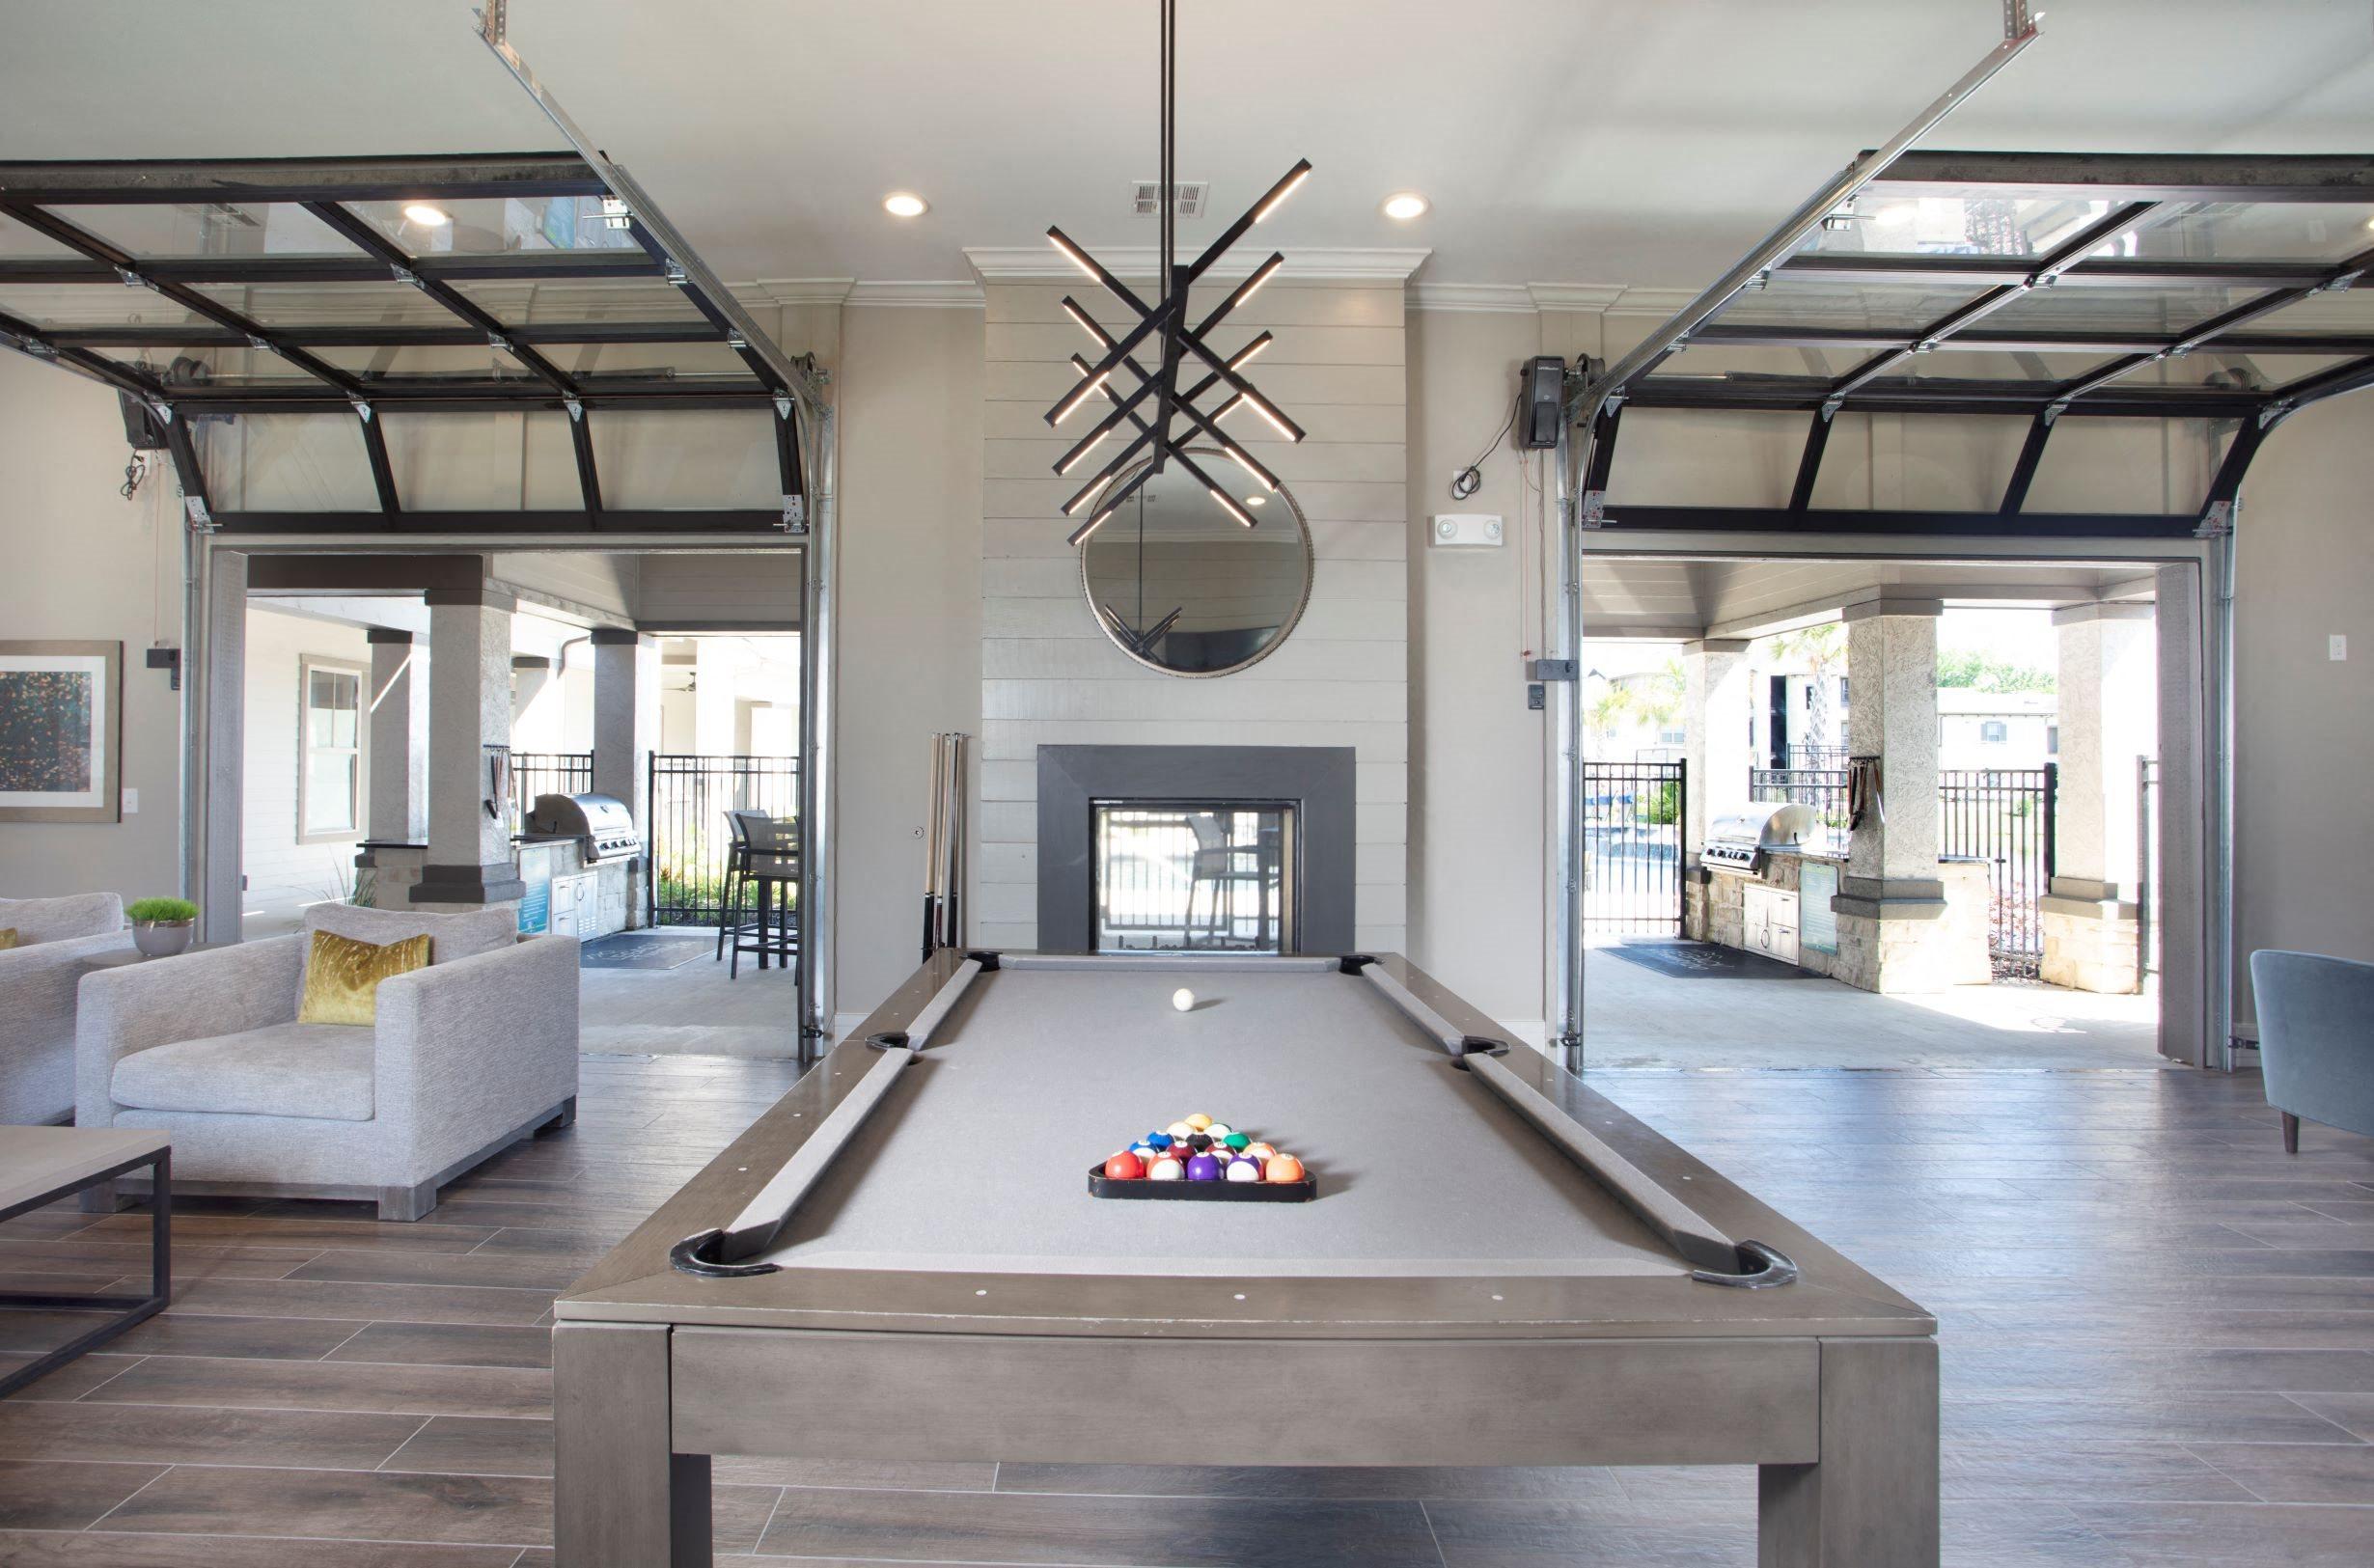 Billiards Room at Legacy at 2020